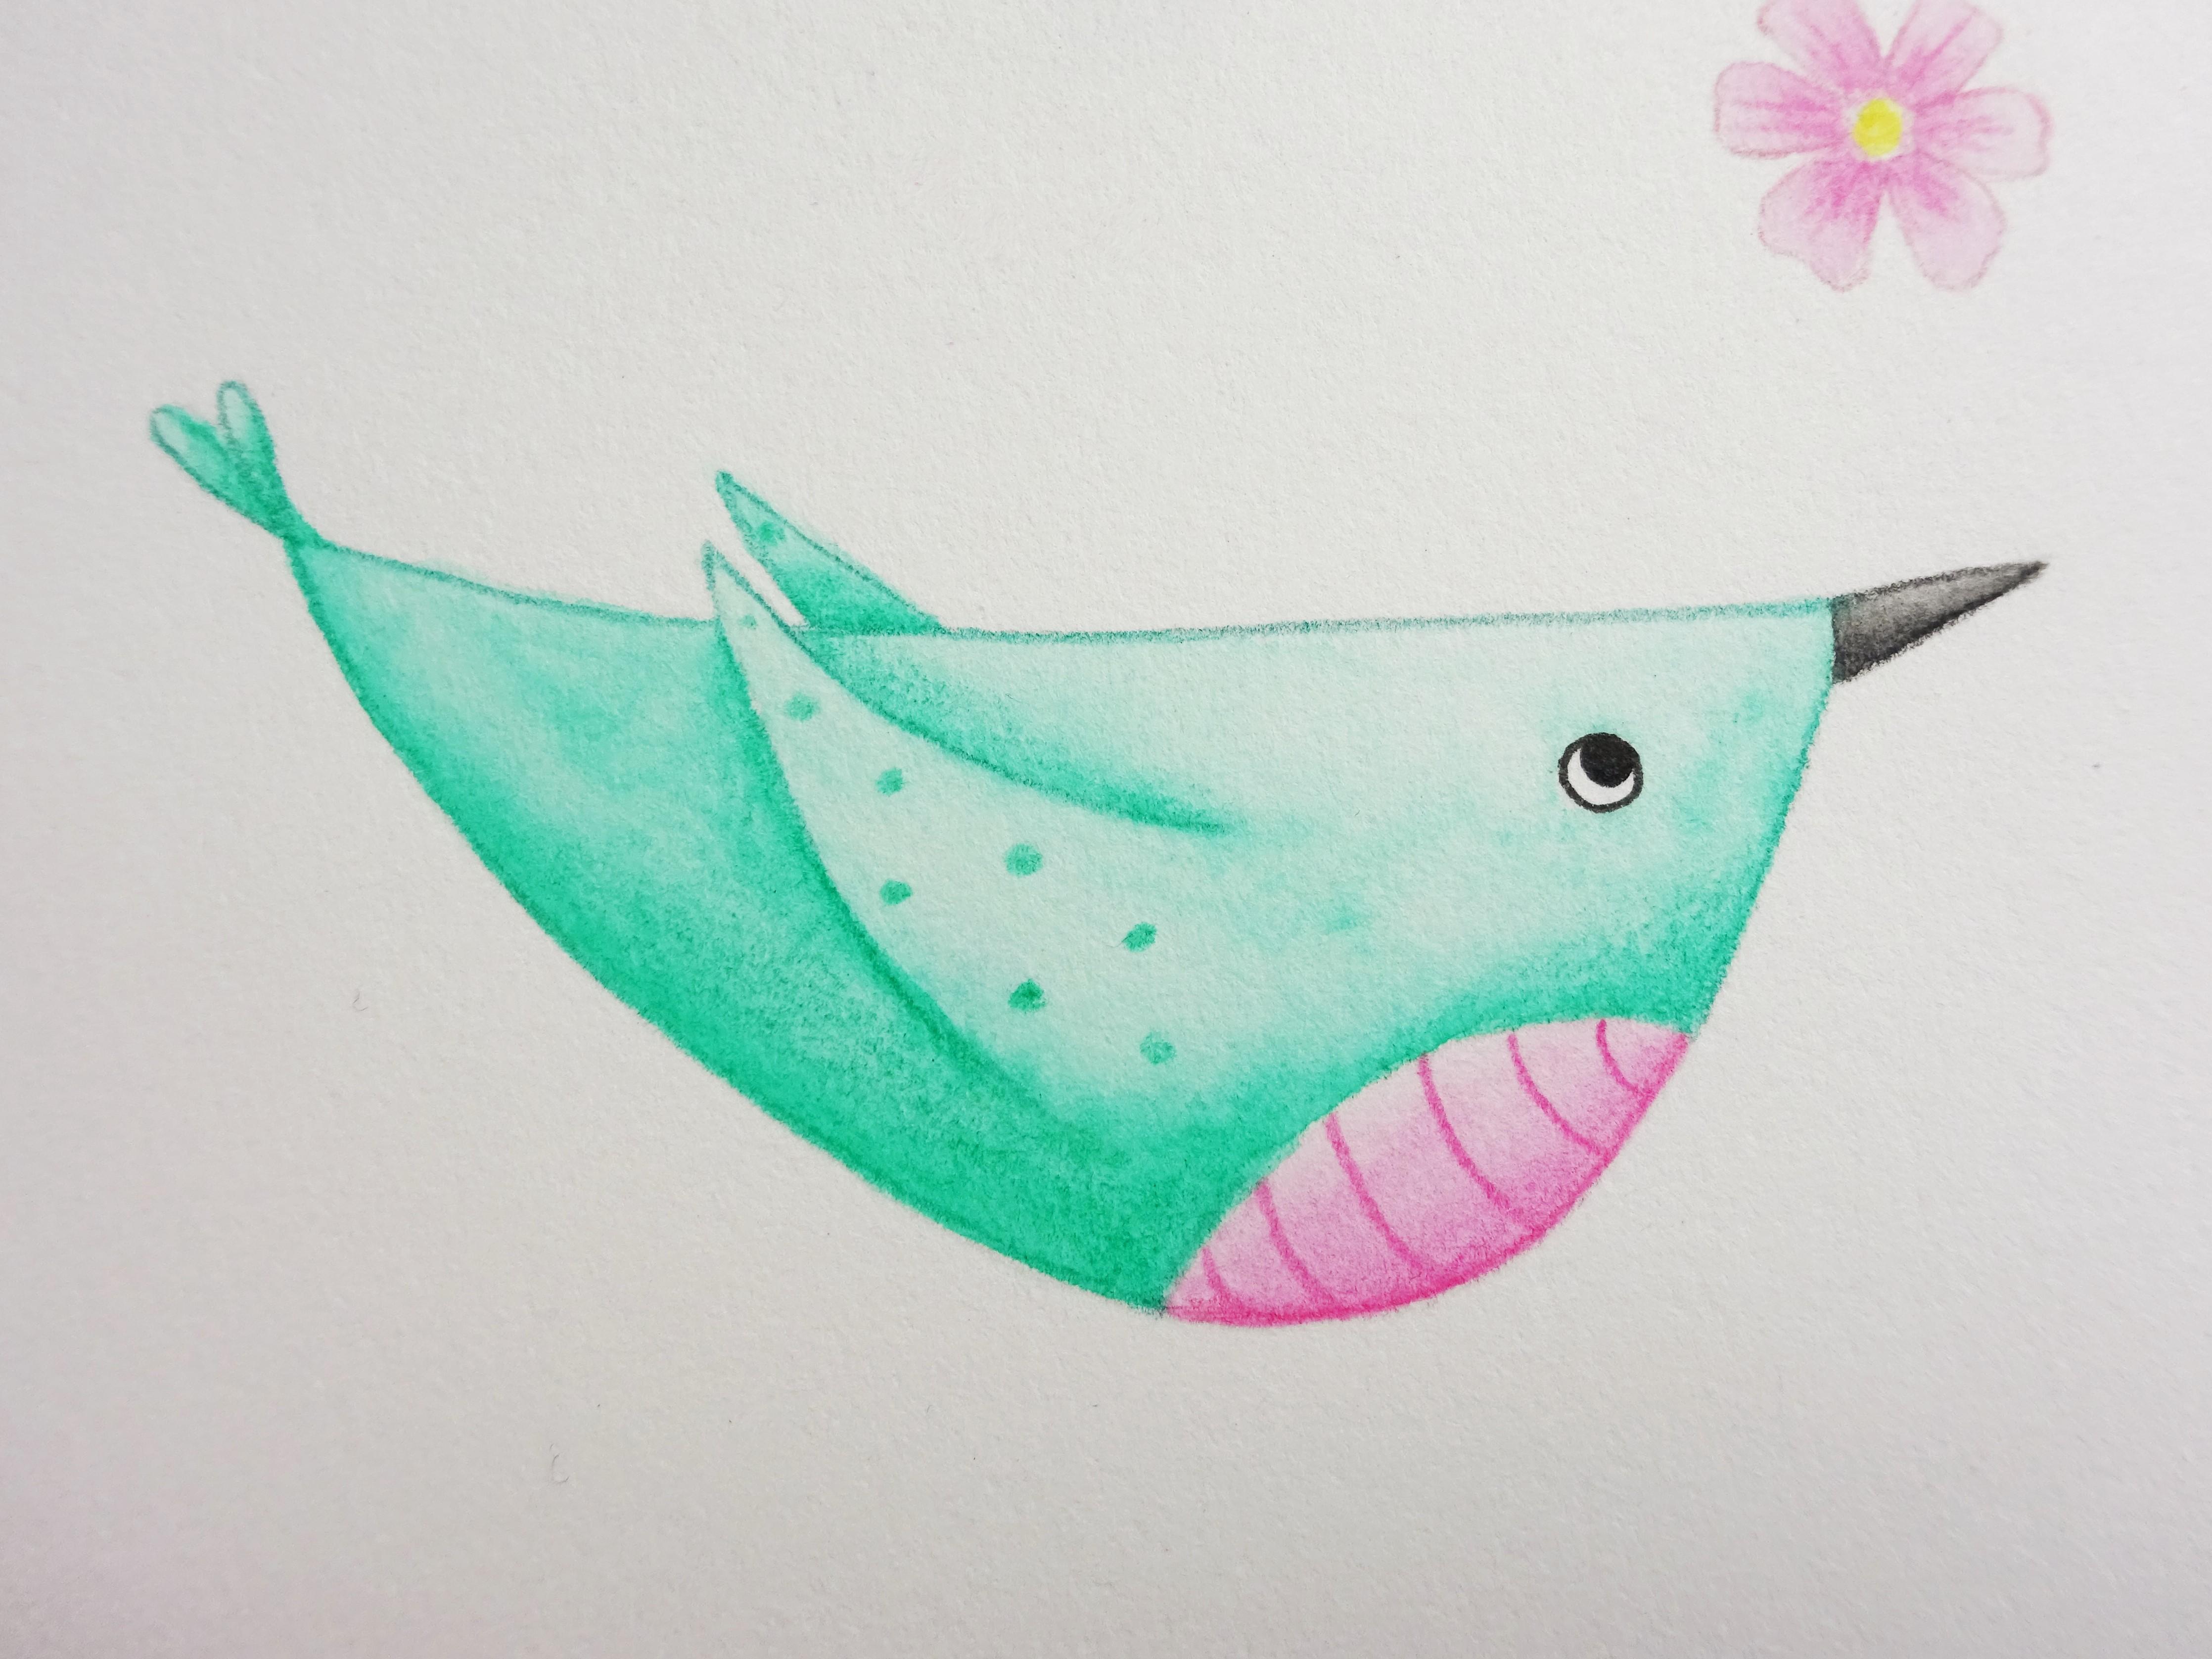 A green watercolour pencil bird with a pink tummy